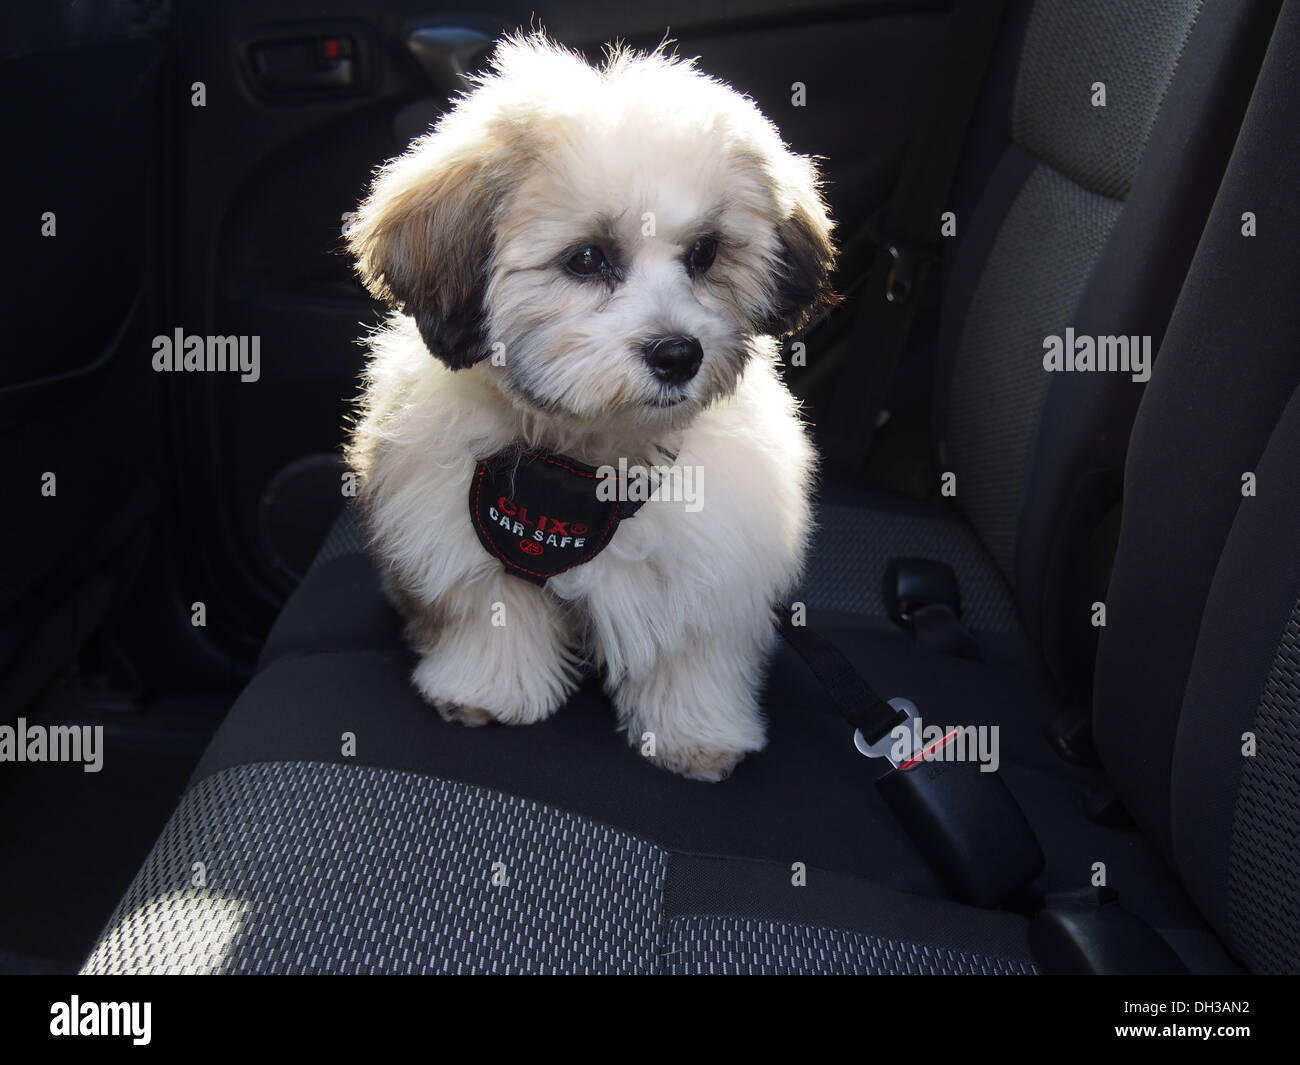 Teddy Bear Puppy A K A Zuchon Mix Of Shih Tzu And Bichon